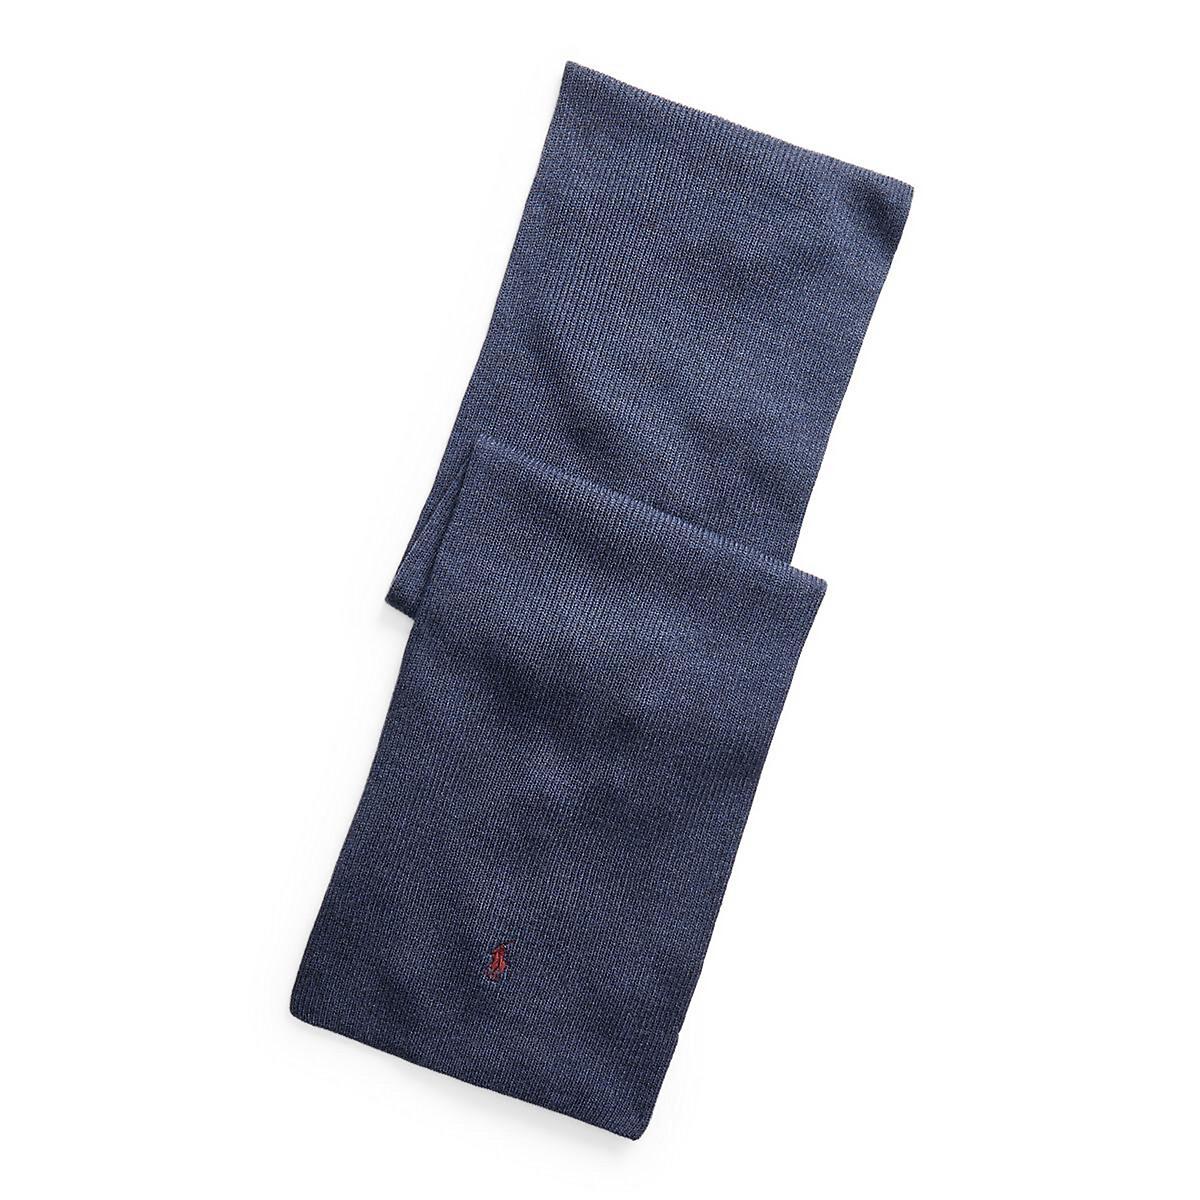 Шарф LaRedoute La Redoute UNI синий жакет la redoute средней длины field демисезонная модель s синий